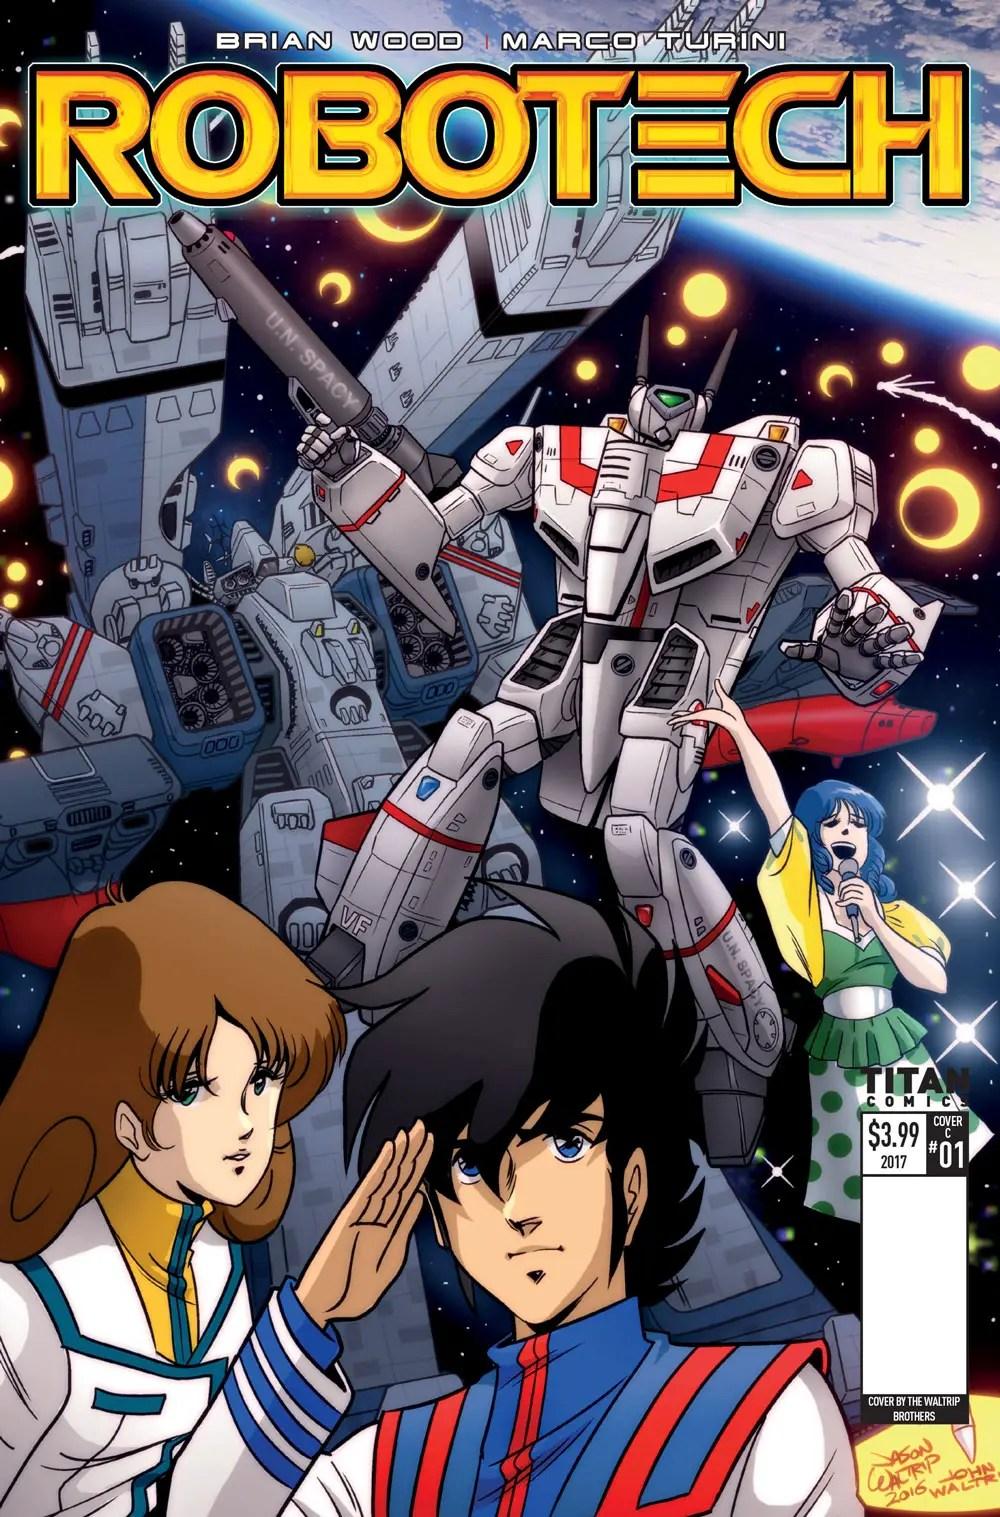 Robotech #1 Review